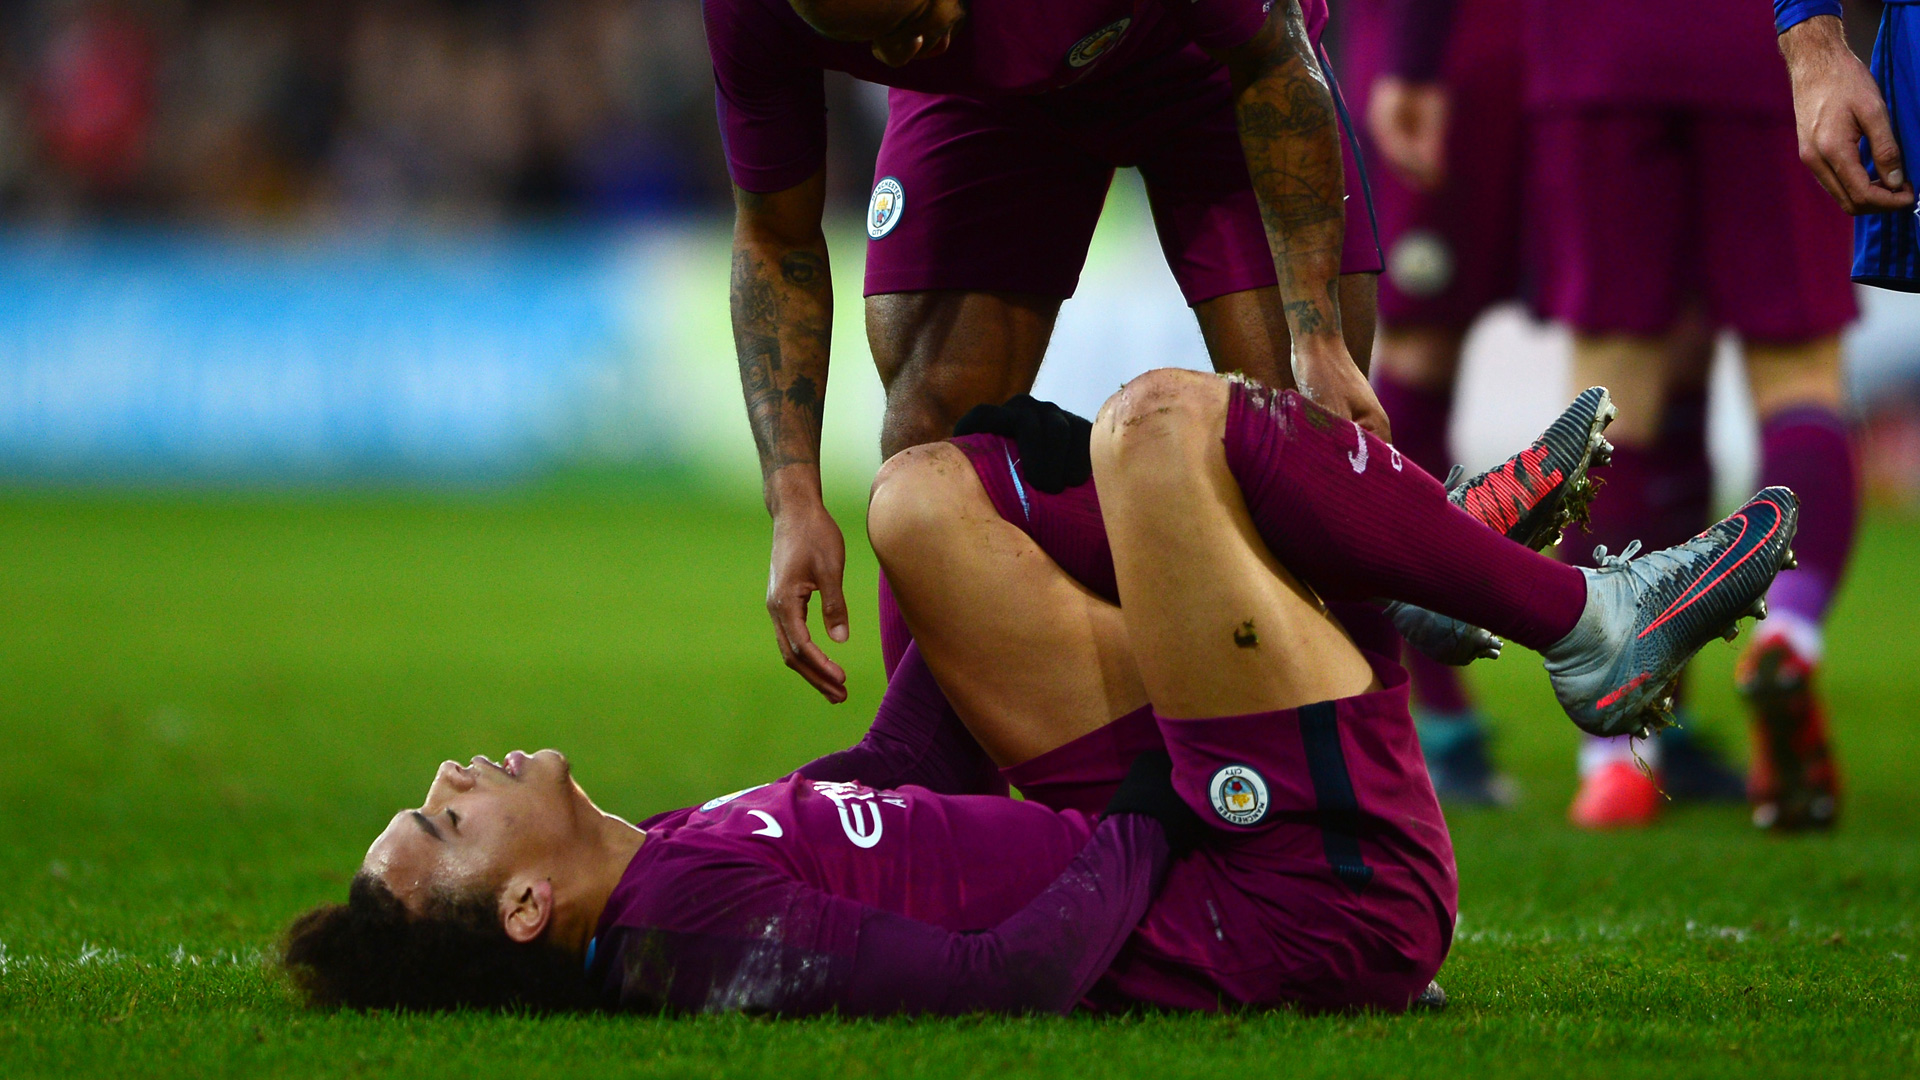 Sorge um Nationalspieler Leroy Sané nach brutalem Foul im englischen FA-Cup